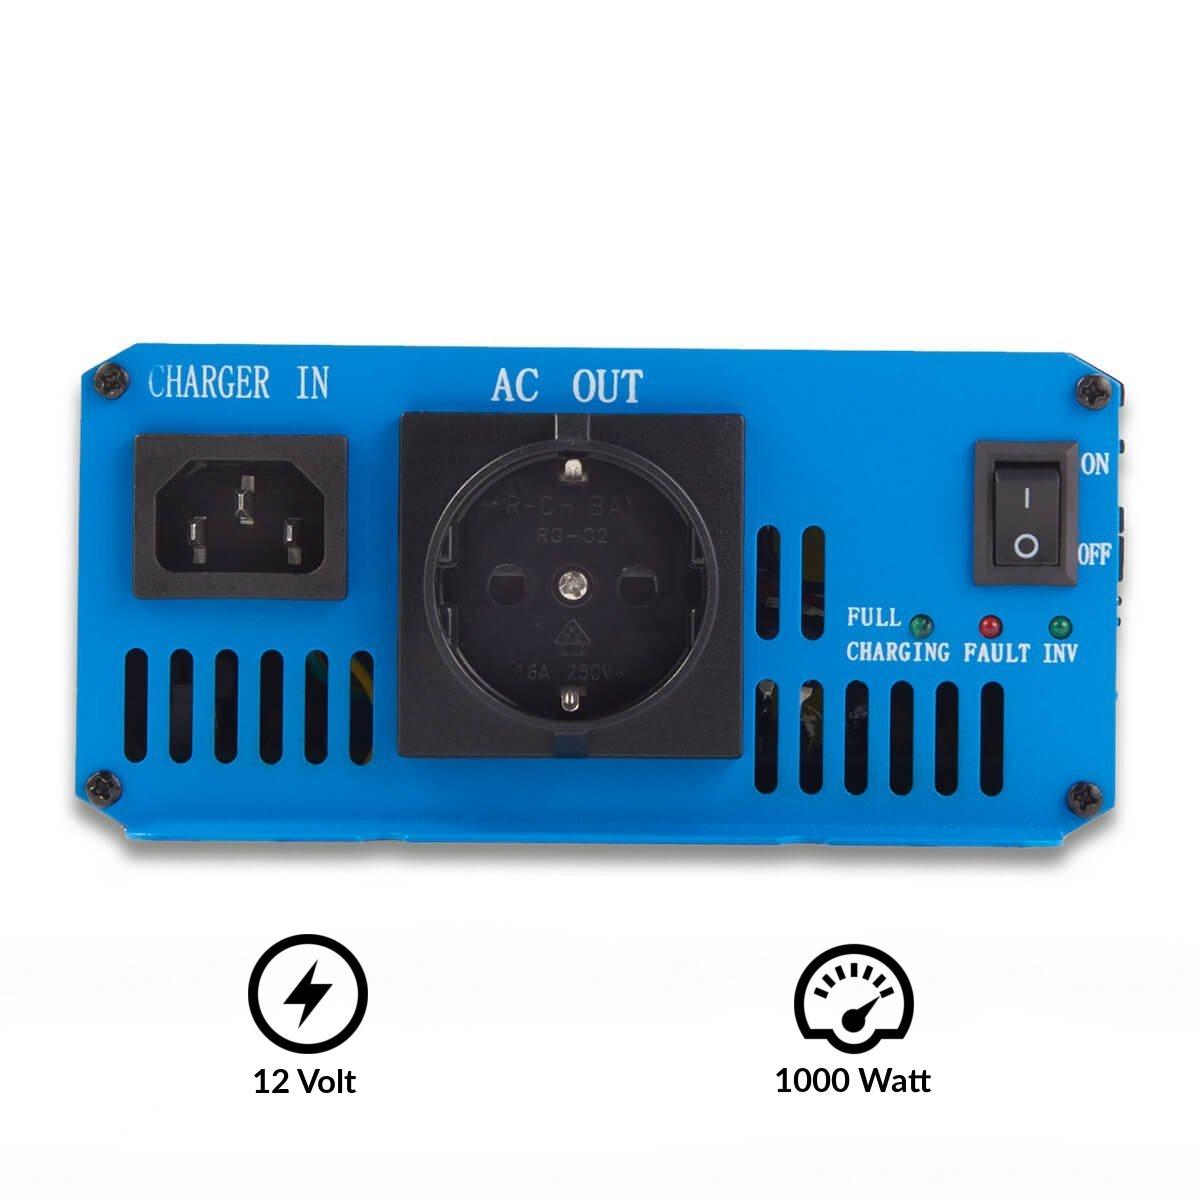 ECTIVE CSI-Serie | Sinus Wechselrichter 1000W mit Batterie Ladegerät ...